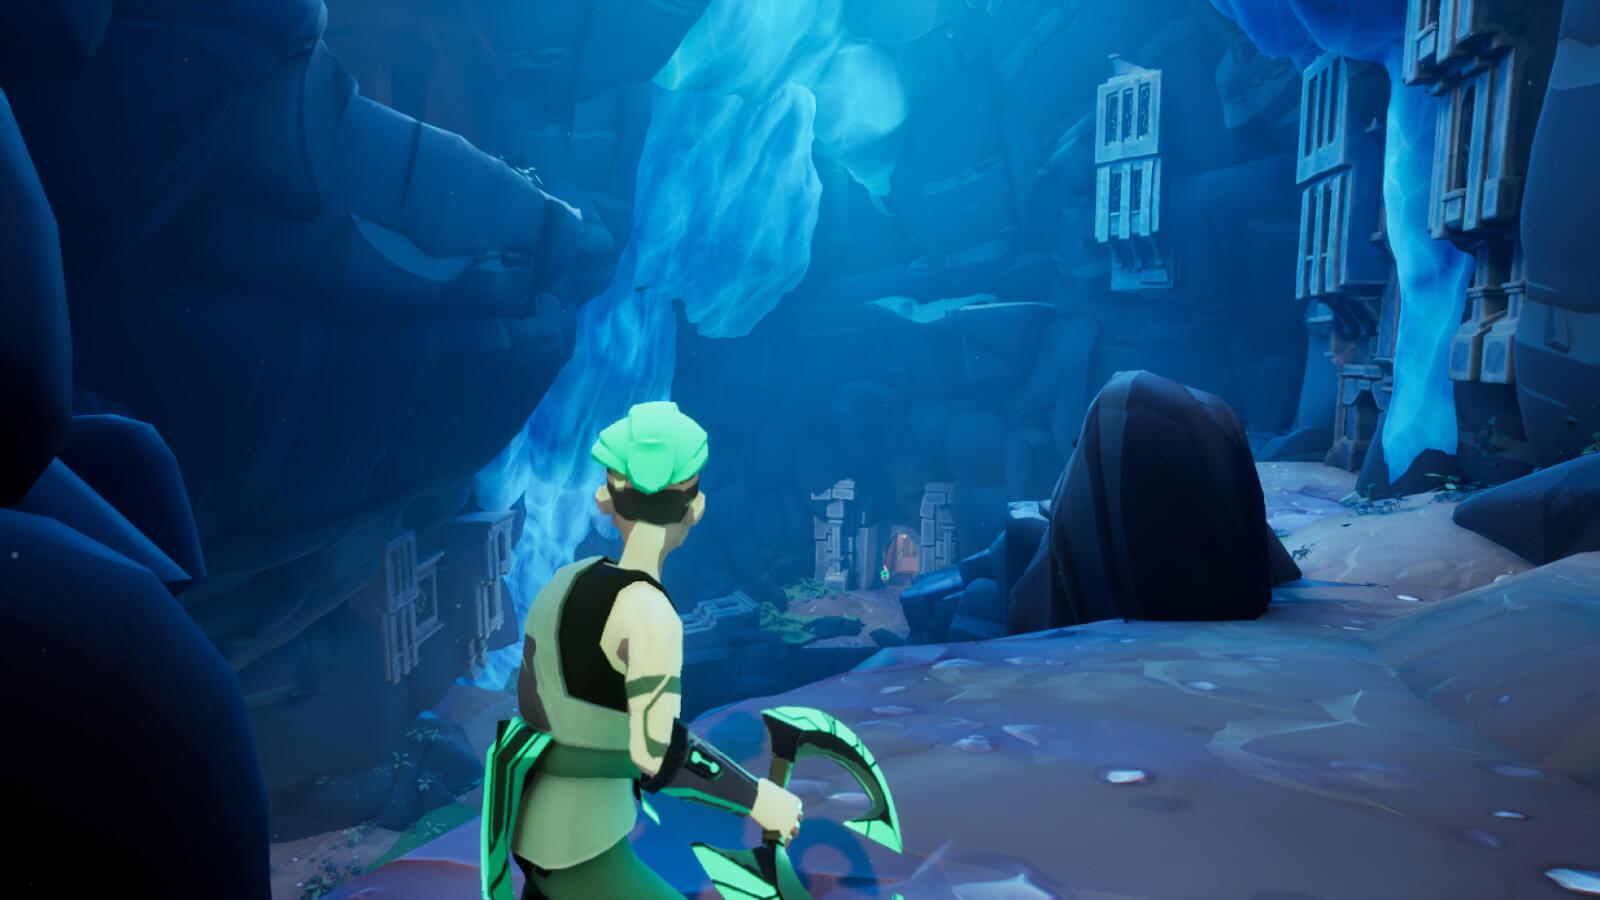 Monk explores an underground city in ruins